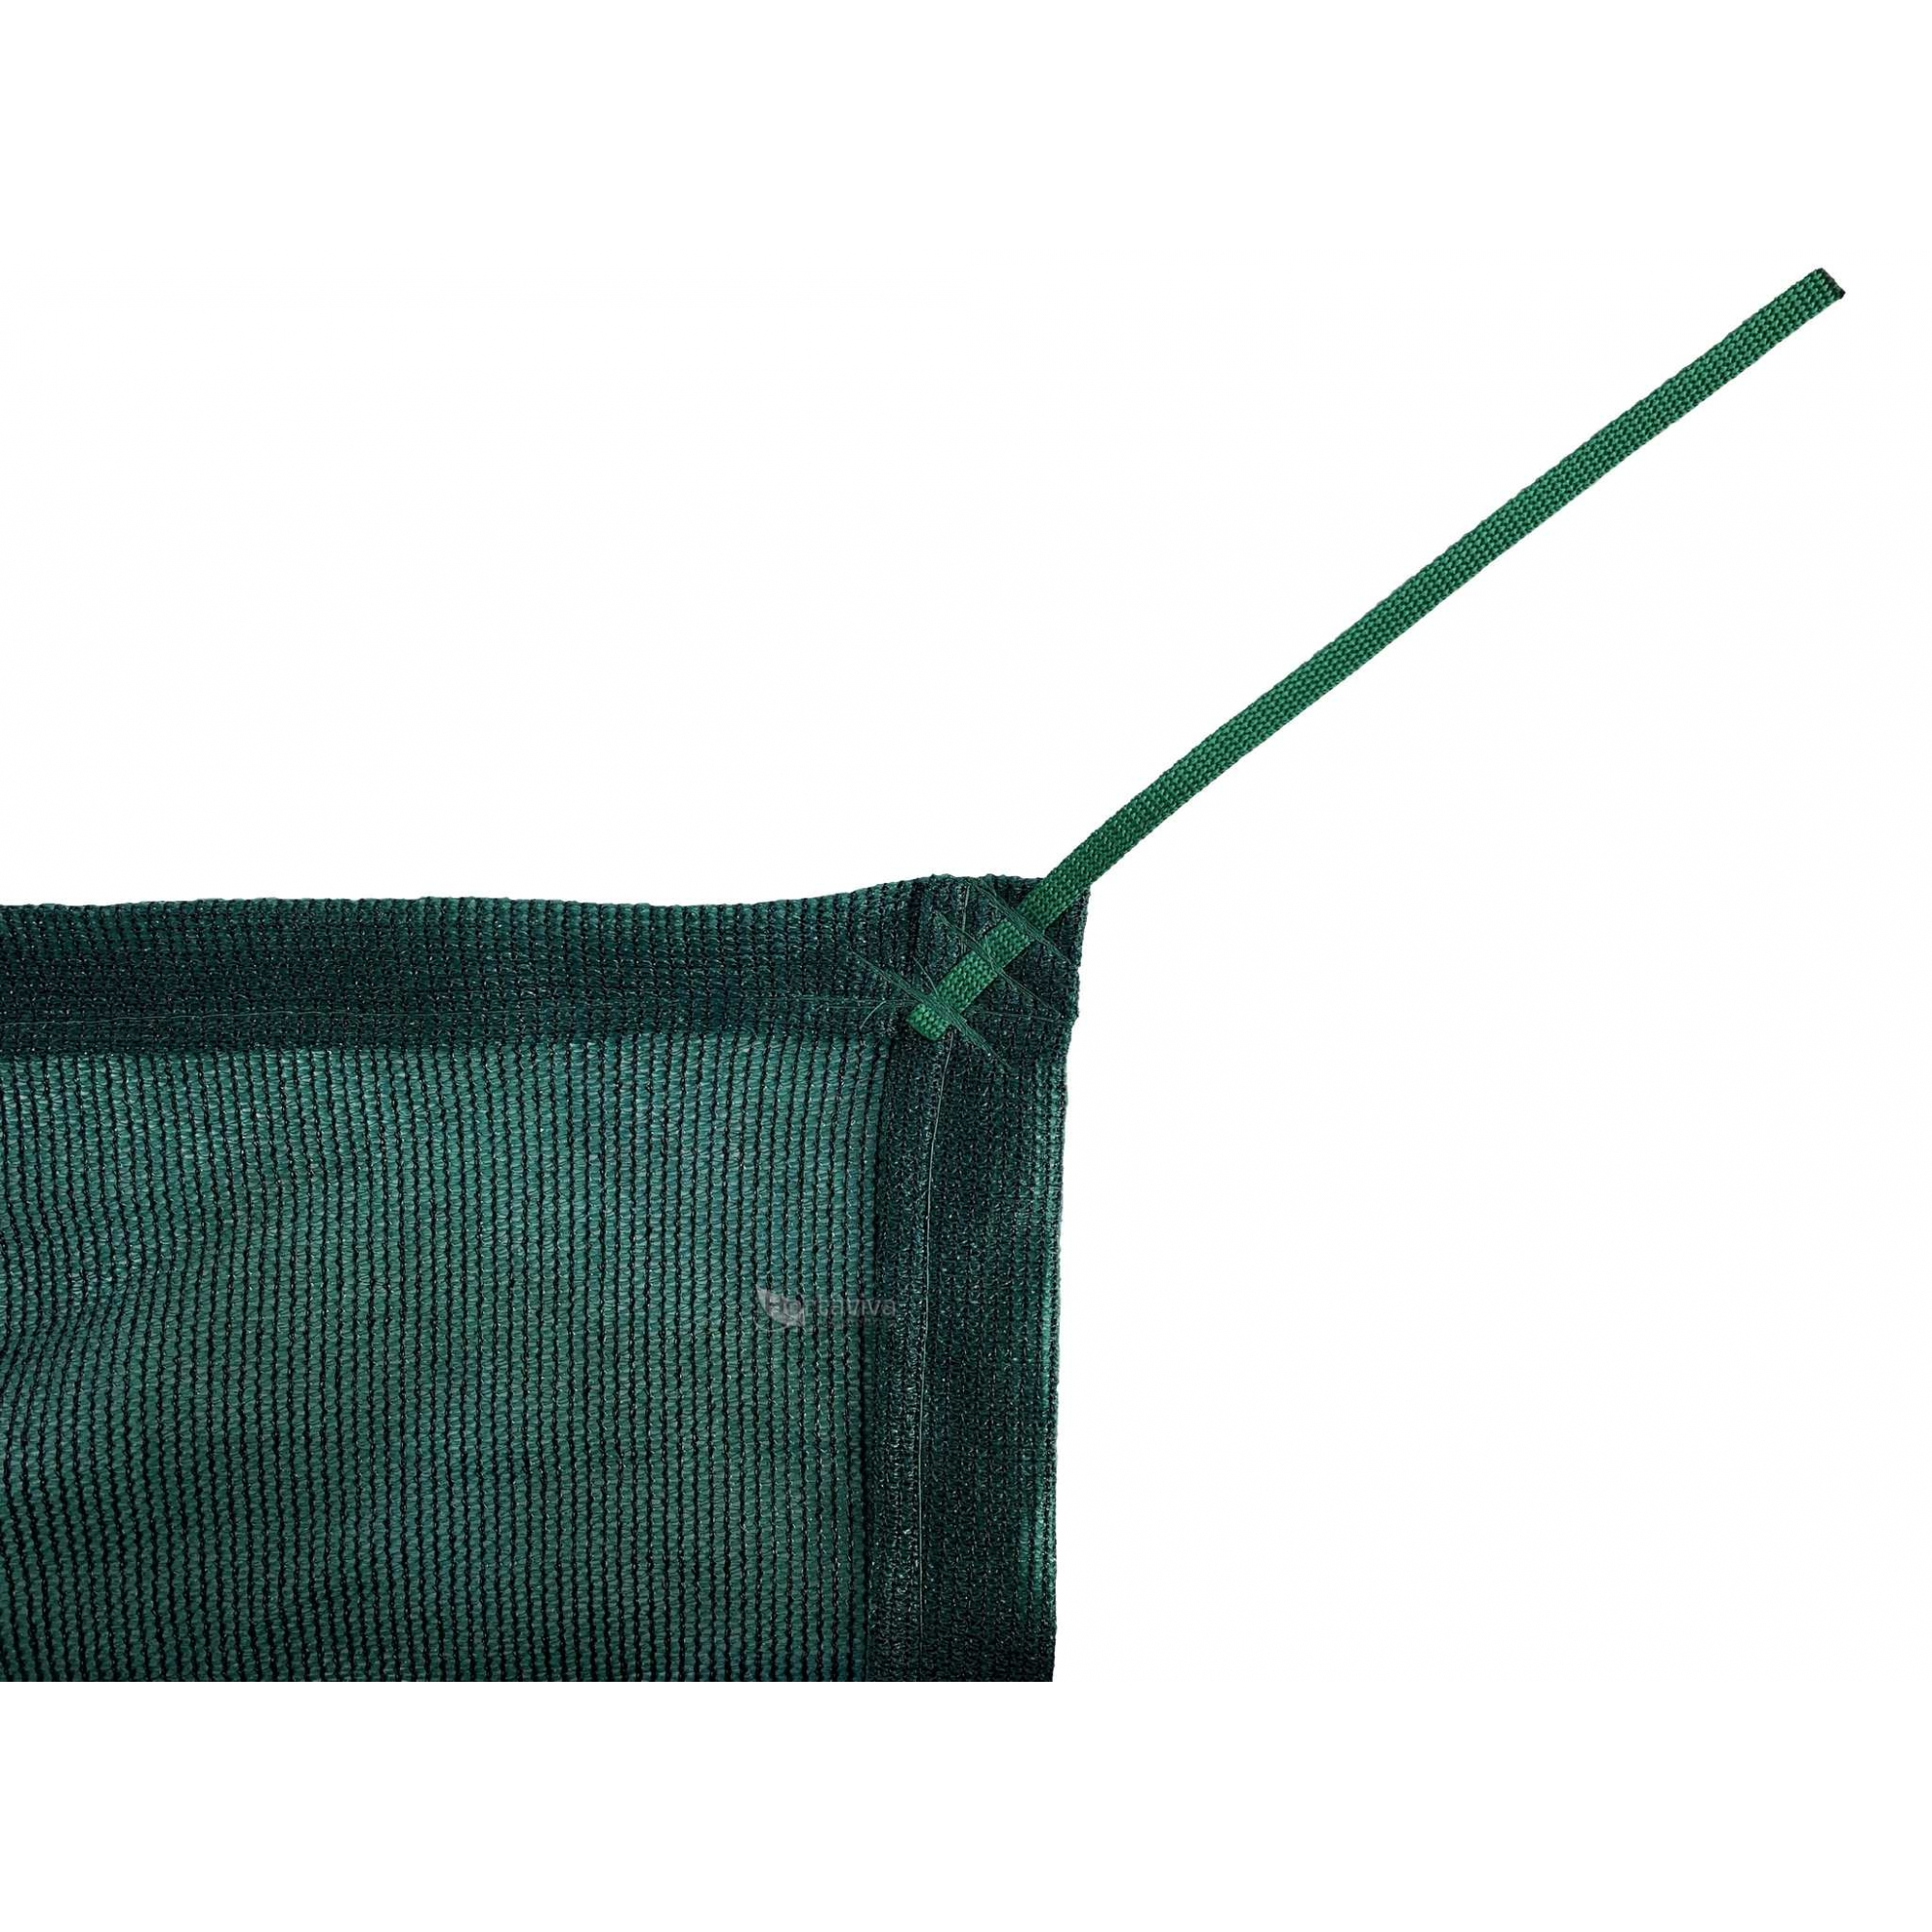 Tela de Sombreamento 80% Verde com Esticadores - Largura: 3 Metros